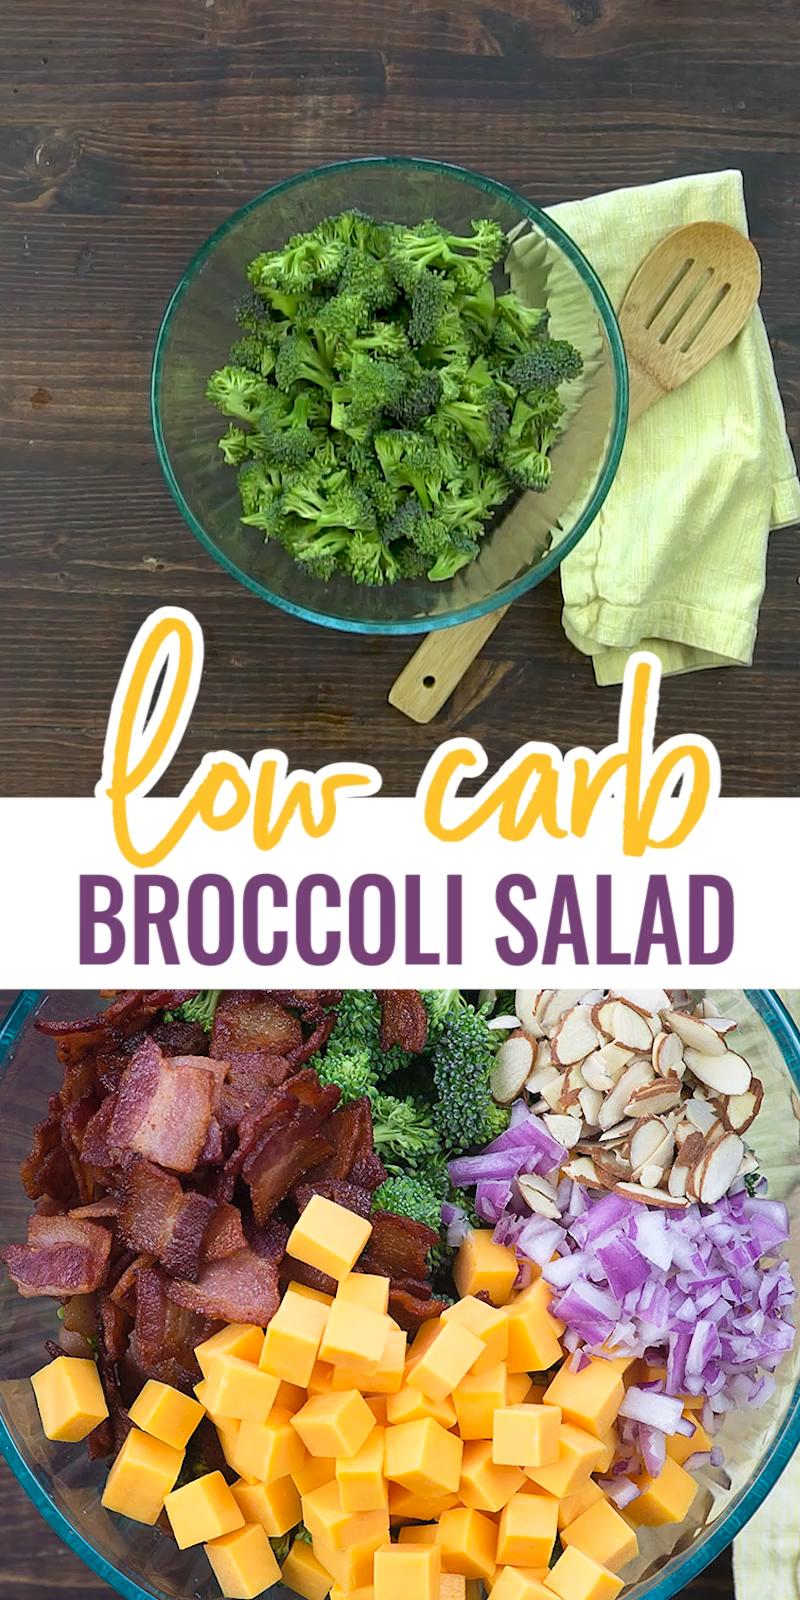 Broccoli Salad with Bacon!